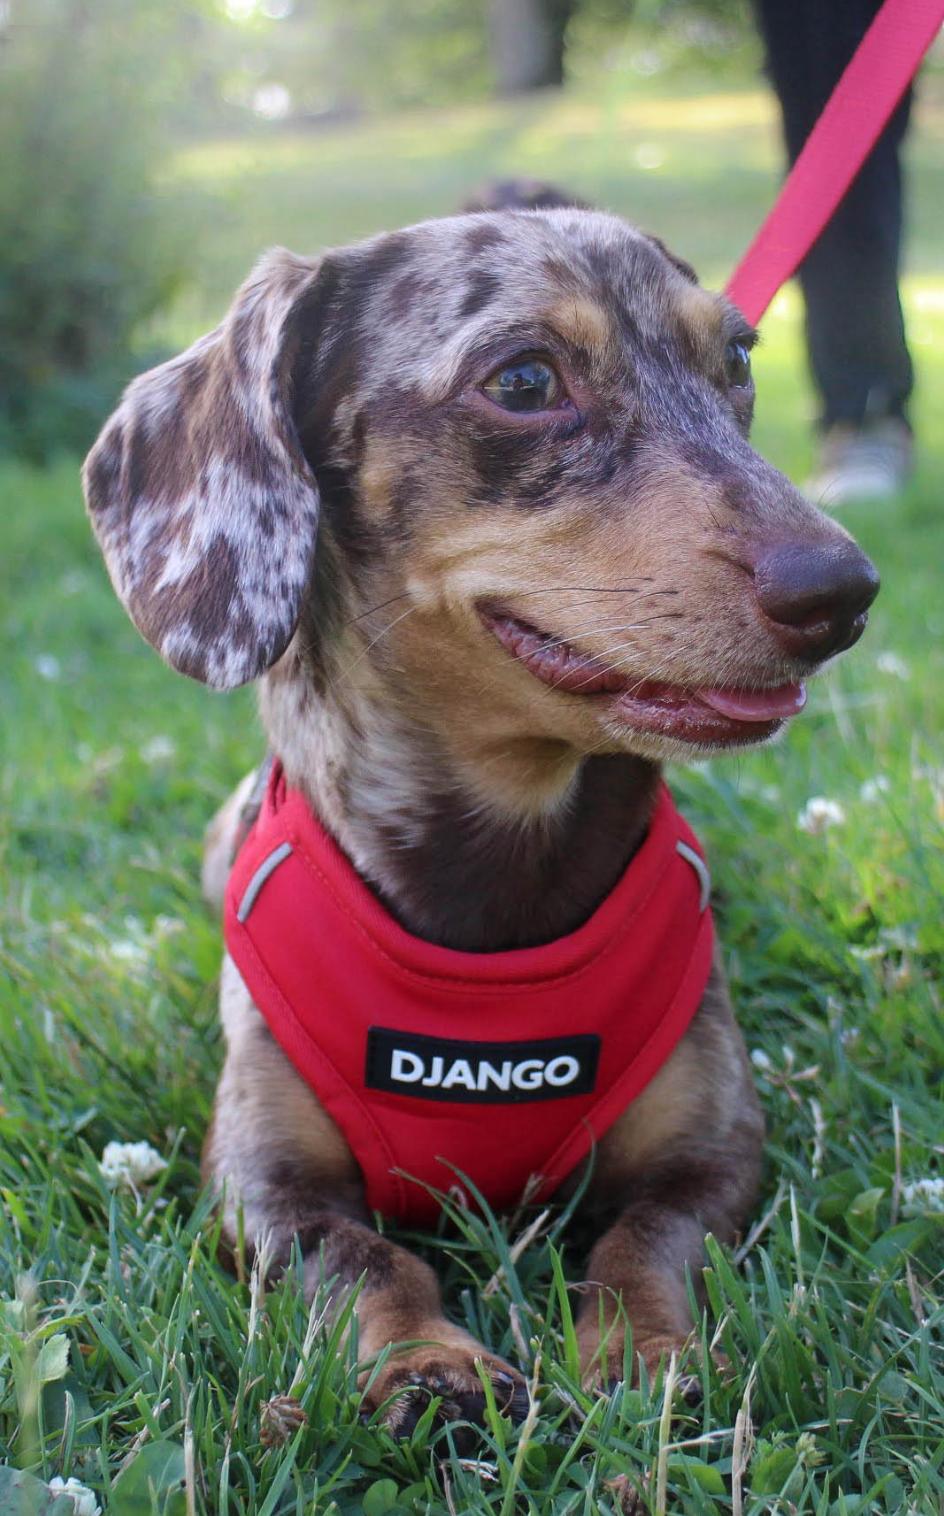 Pin On Django Adventure Dog Harness And Leash Collection